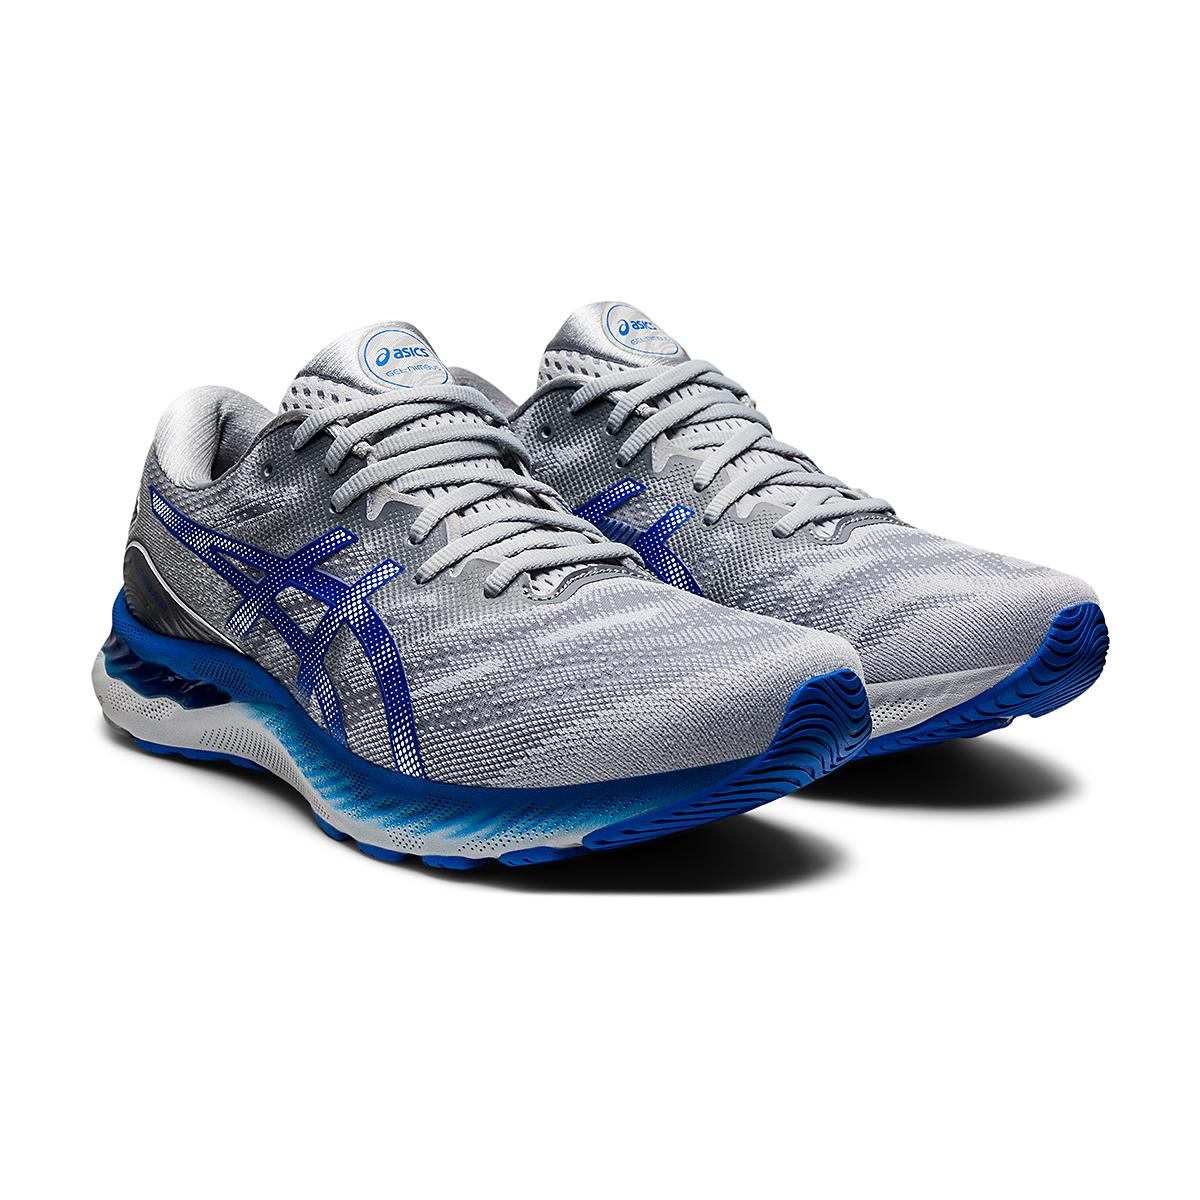 Men's Asics Gel-Nimbus 23 Running Shoe - Color: Piedmont Grey - Size: 6 - Width: Regular, Piedmont Grey, large, image 3